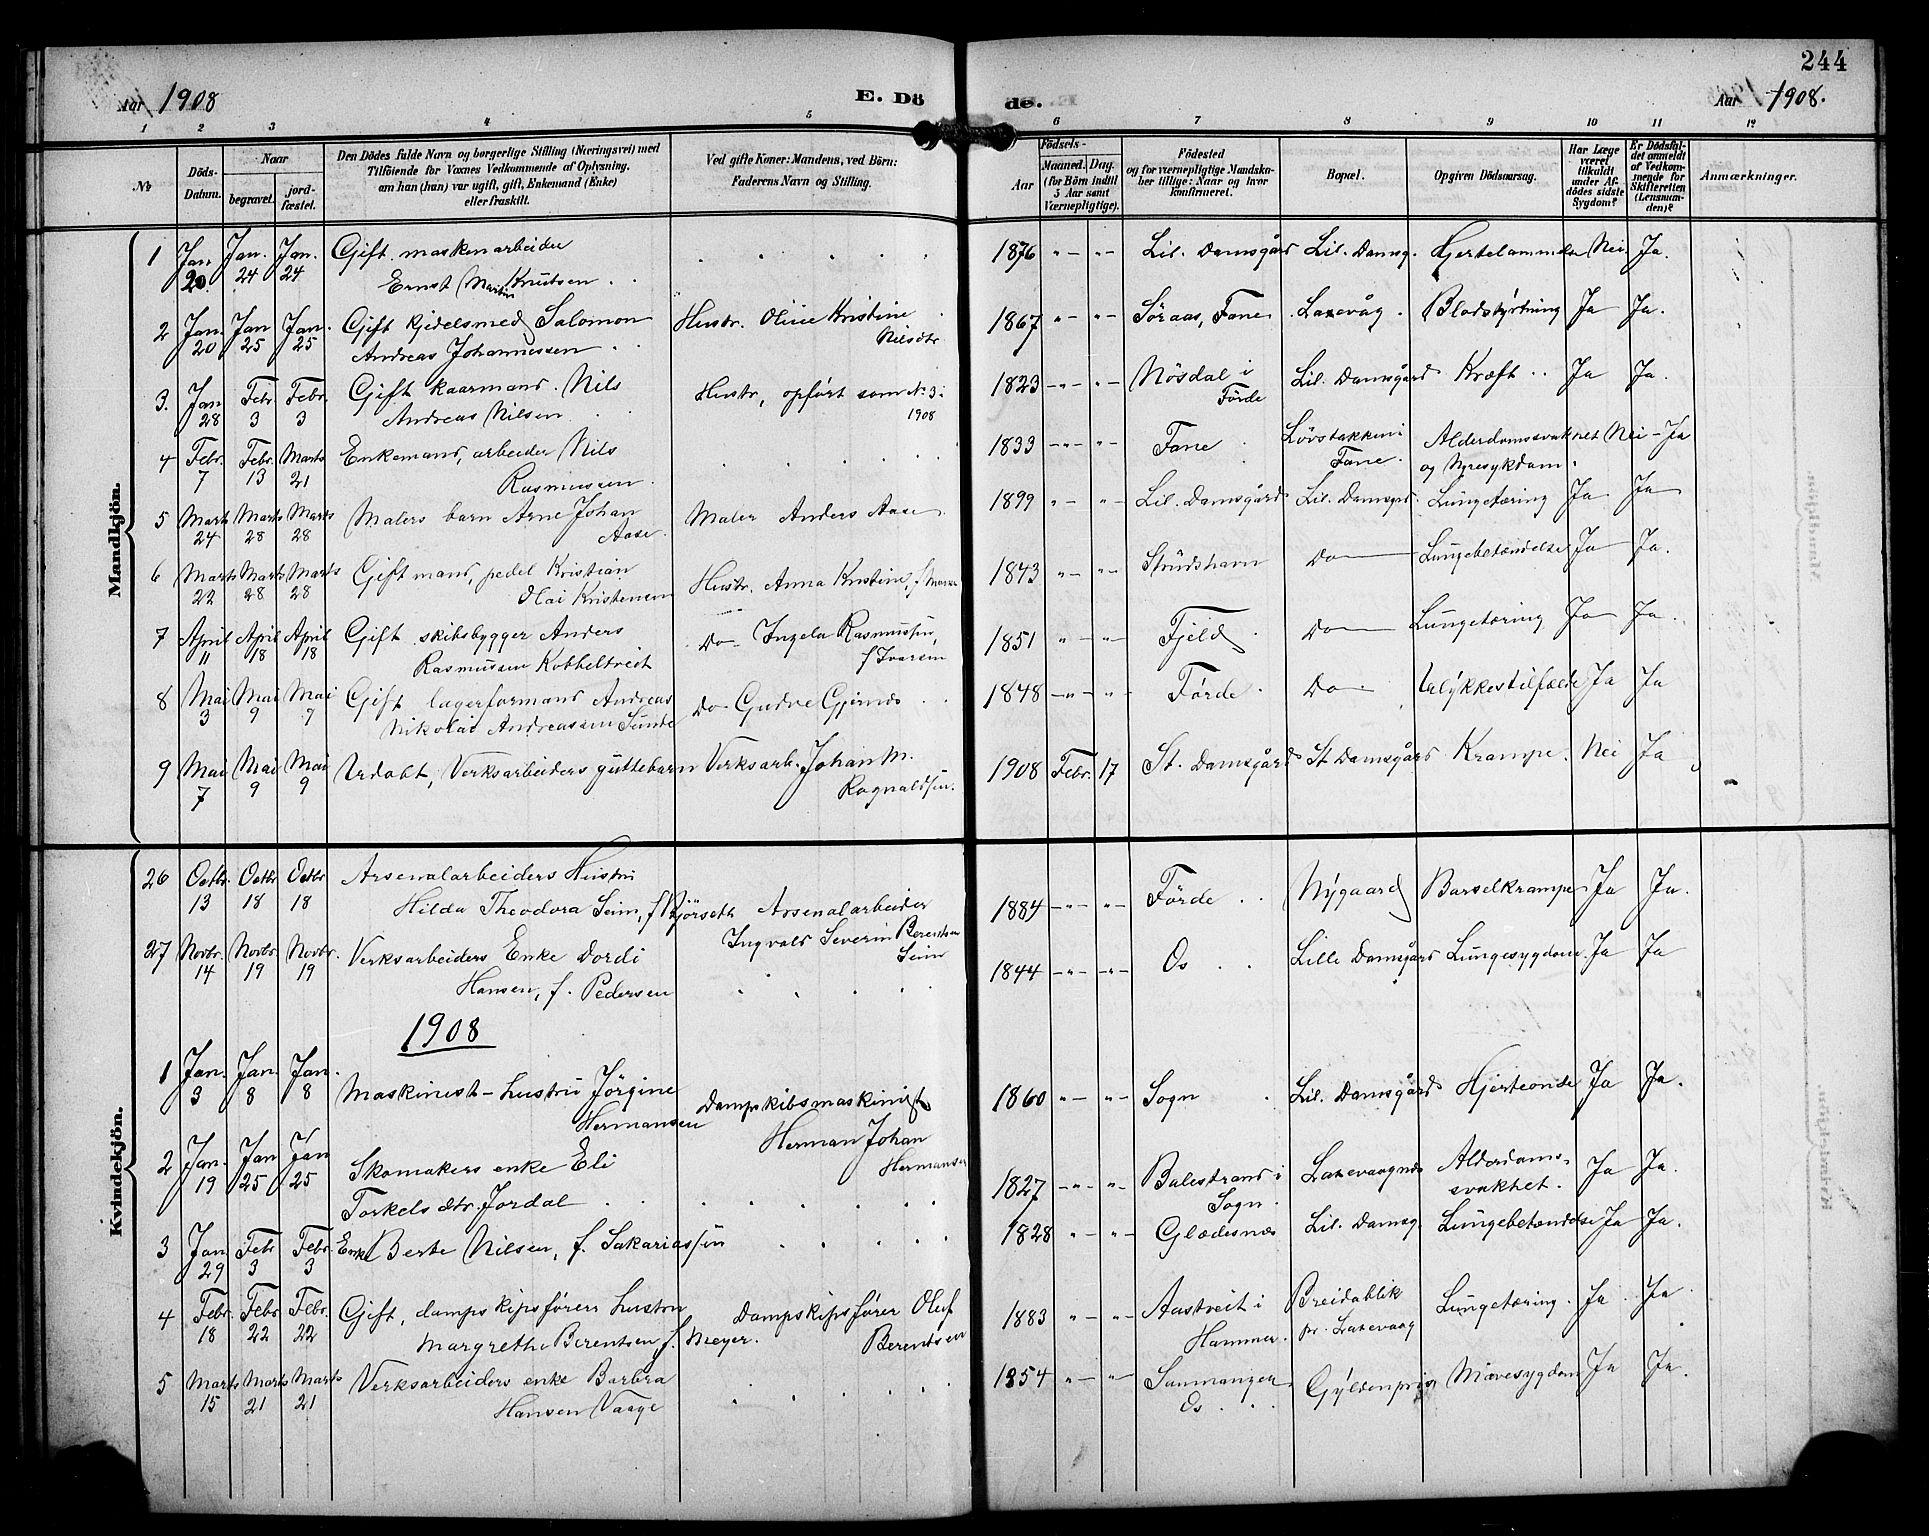 SAB, Laksevåg Sokneprestembete, H/Ha/Hab/Haba/L0004: Klokkerbok nr. A 4, 1899-1909, s. 244